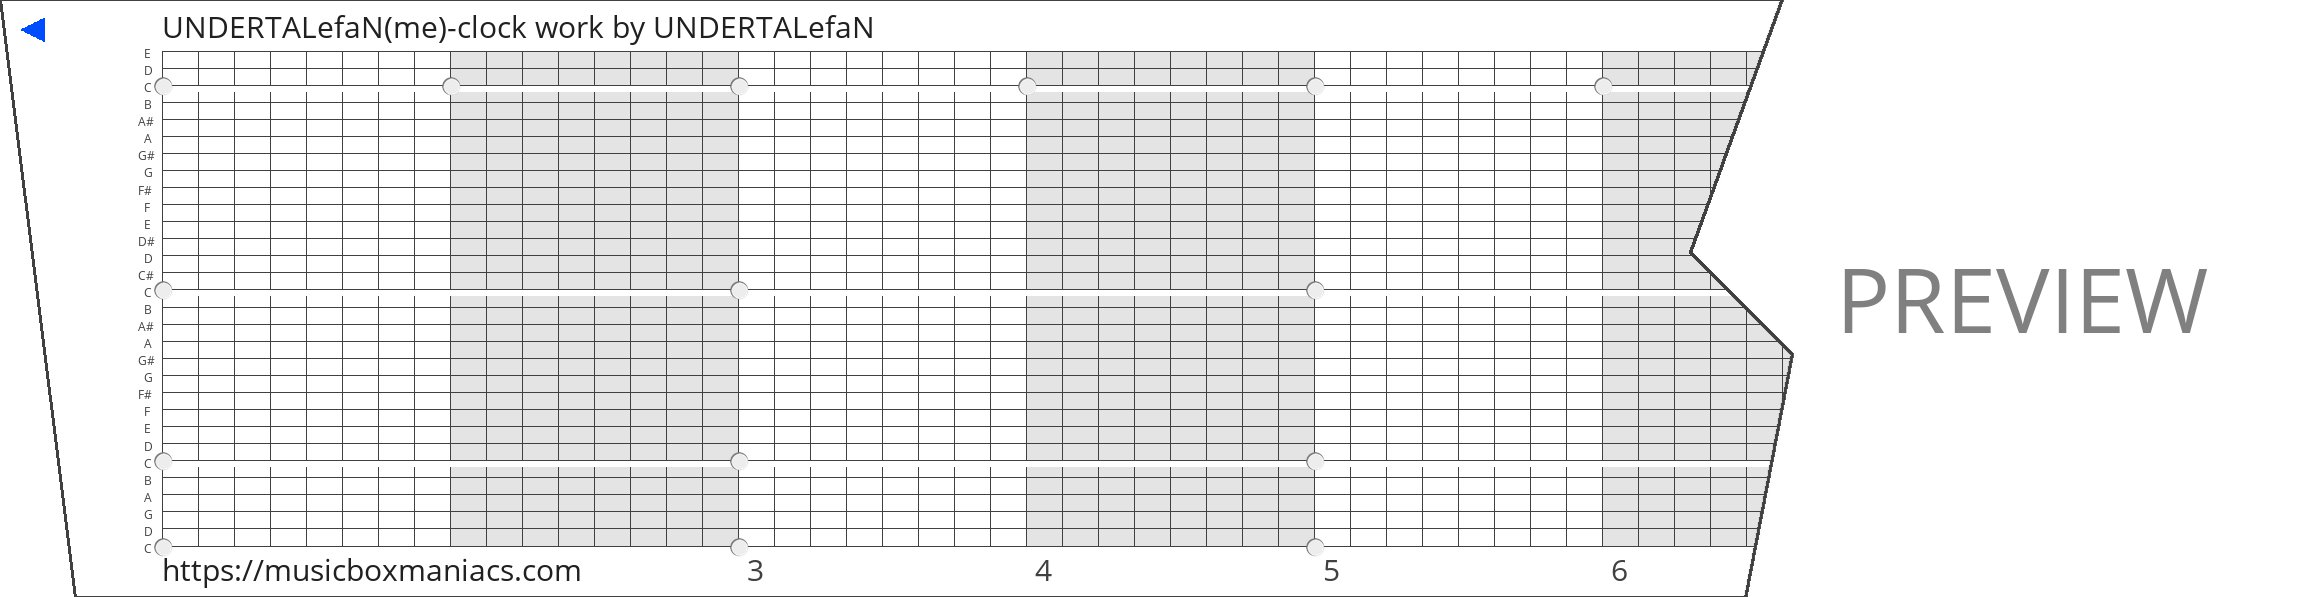 UNDERTALefaN(me)-clock work 30 note music box paper strip